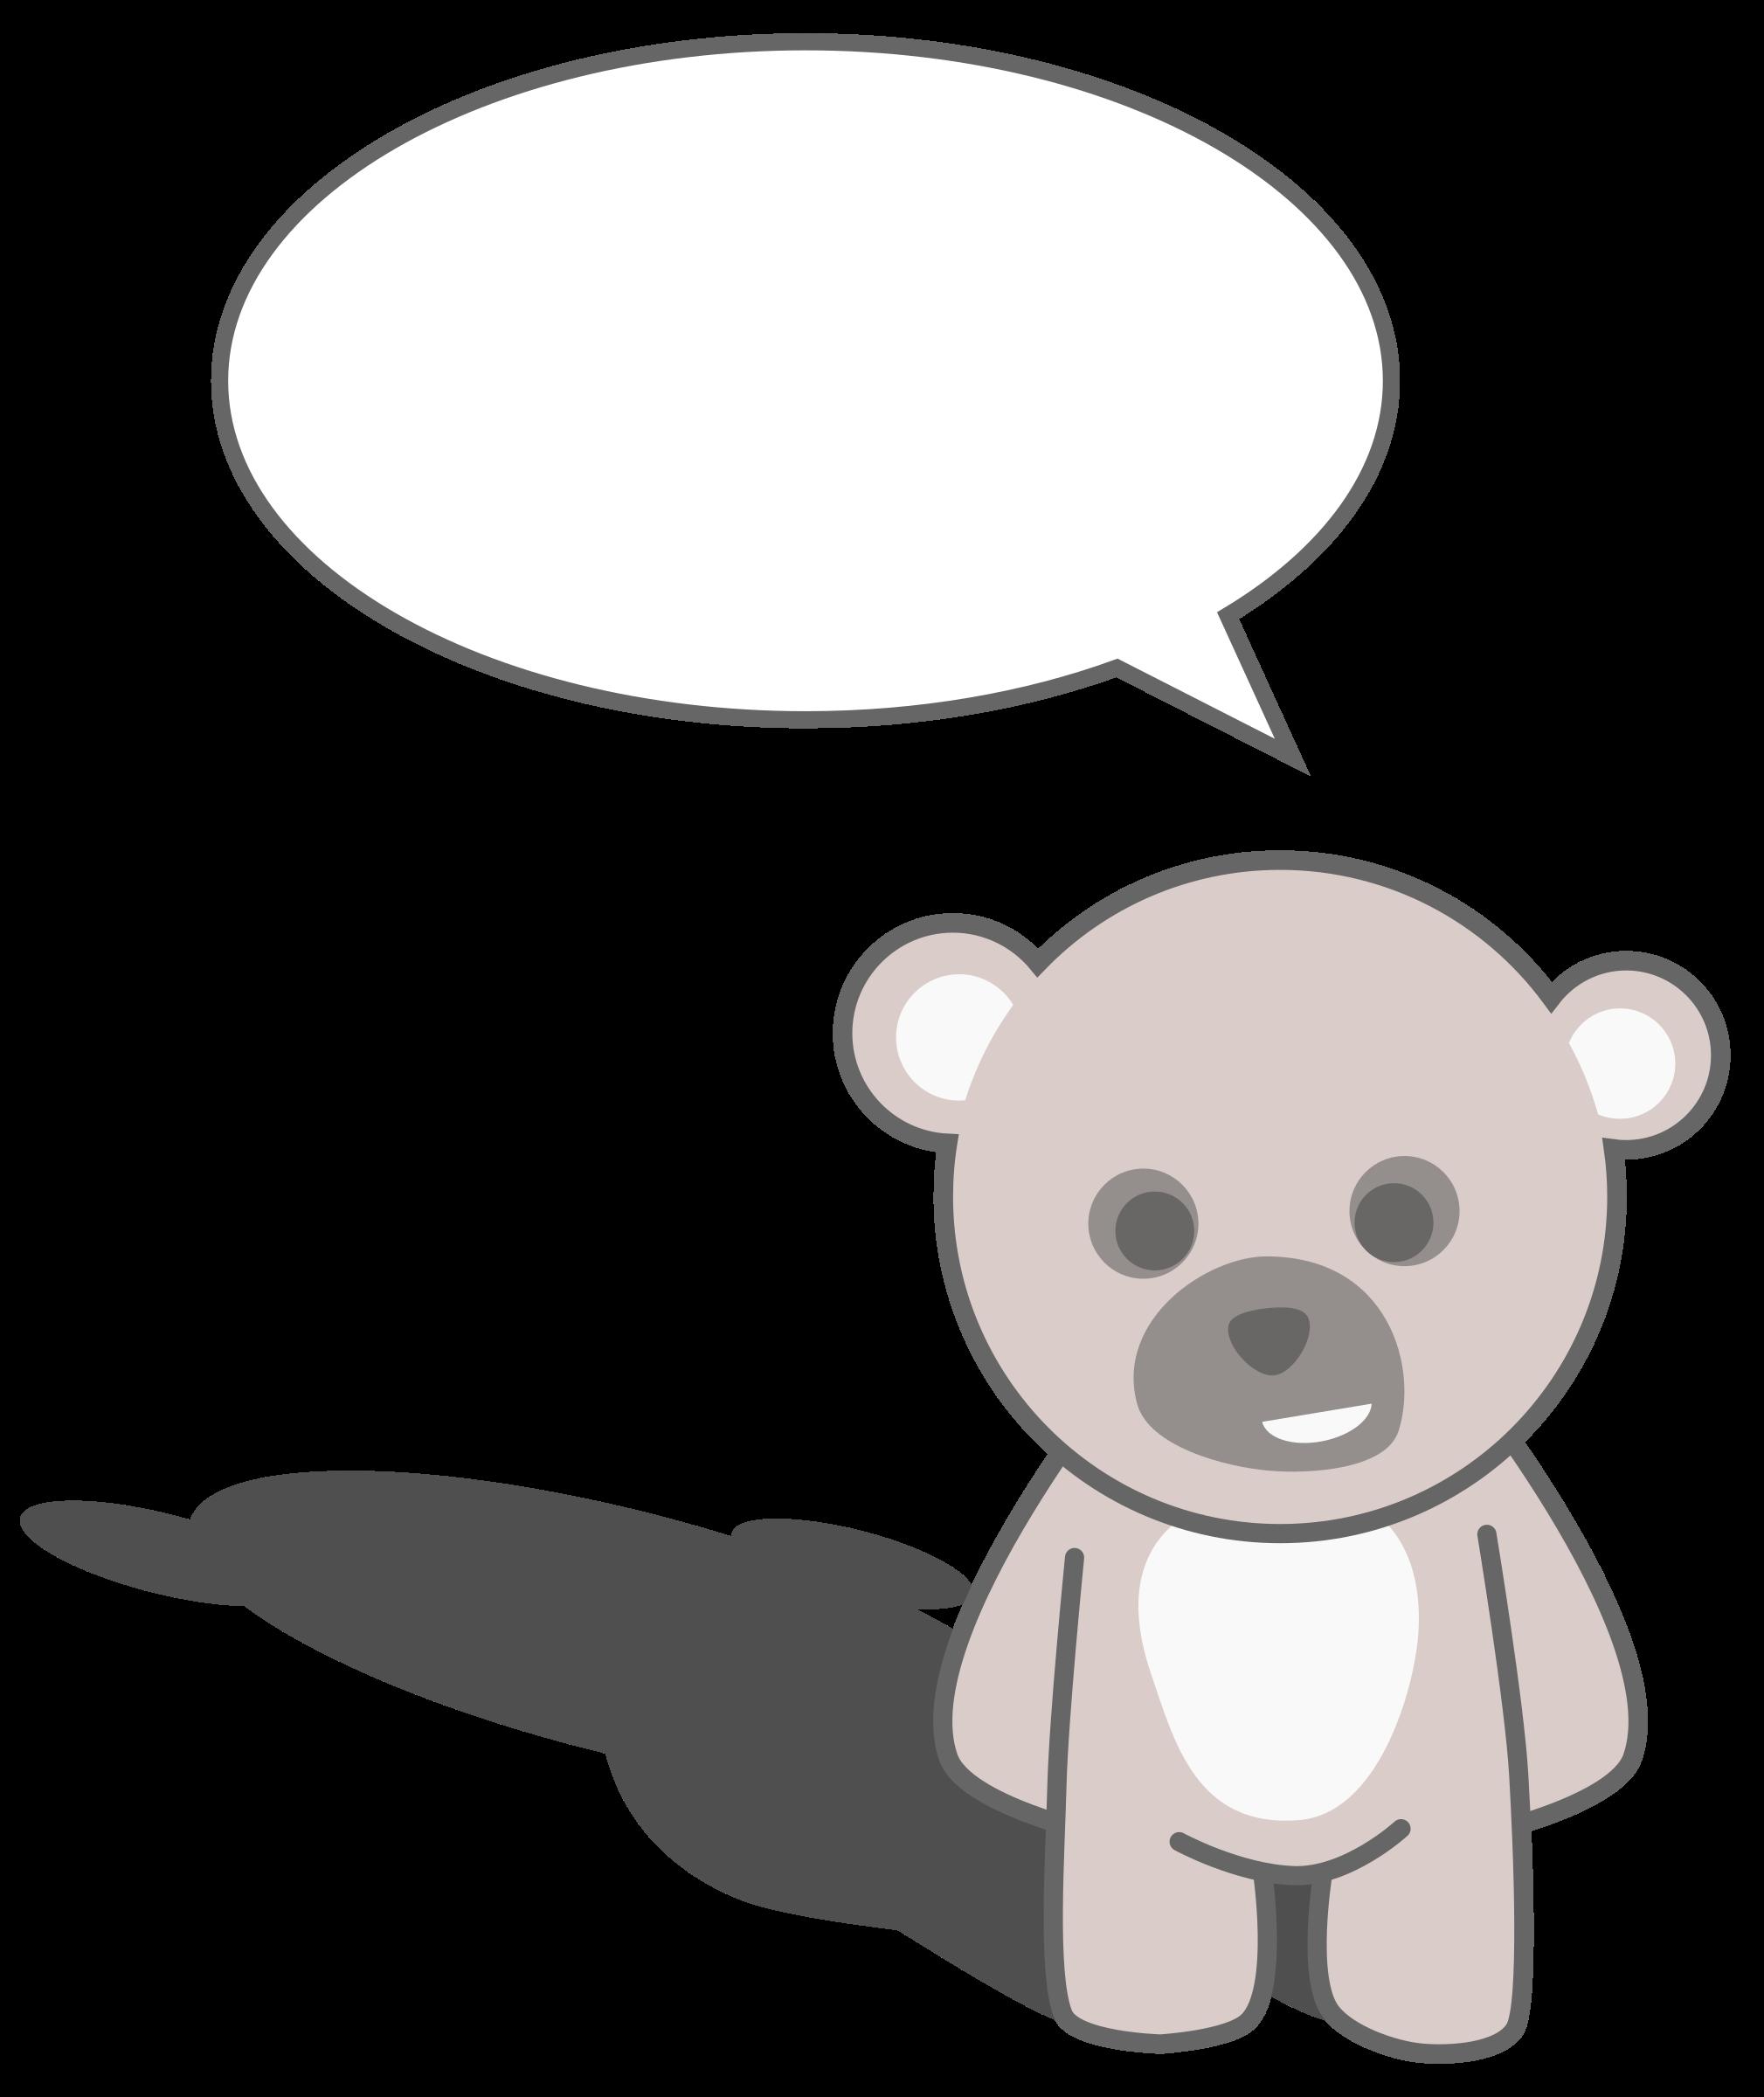 2019x2400 Cute Teddy Bear Icons Png